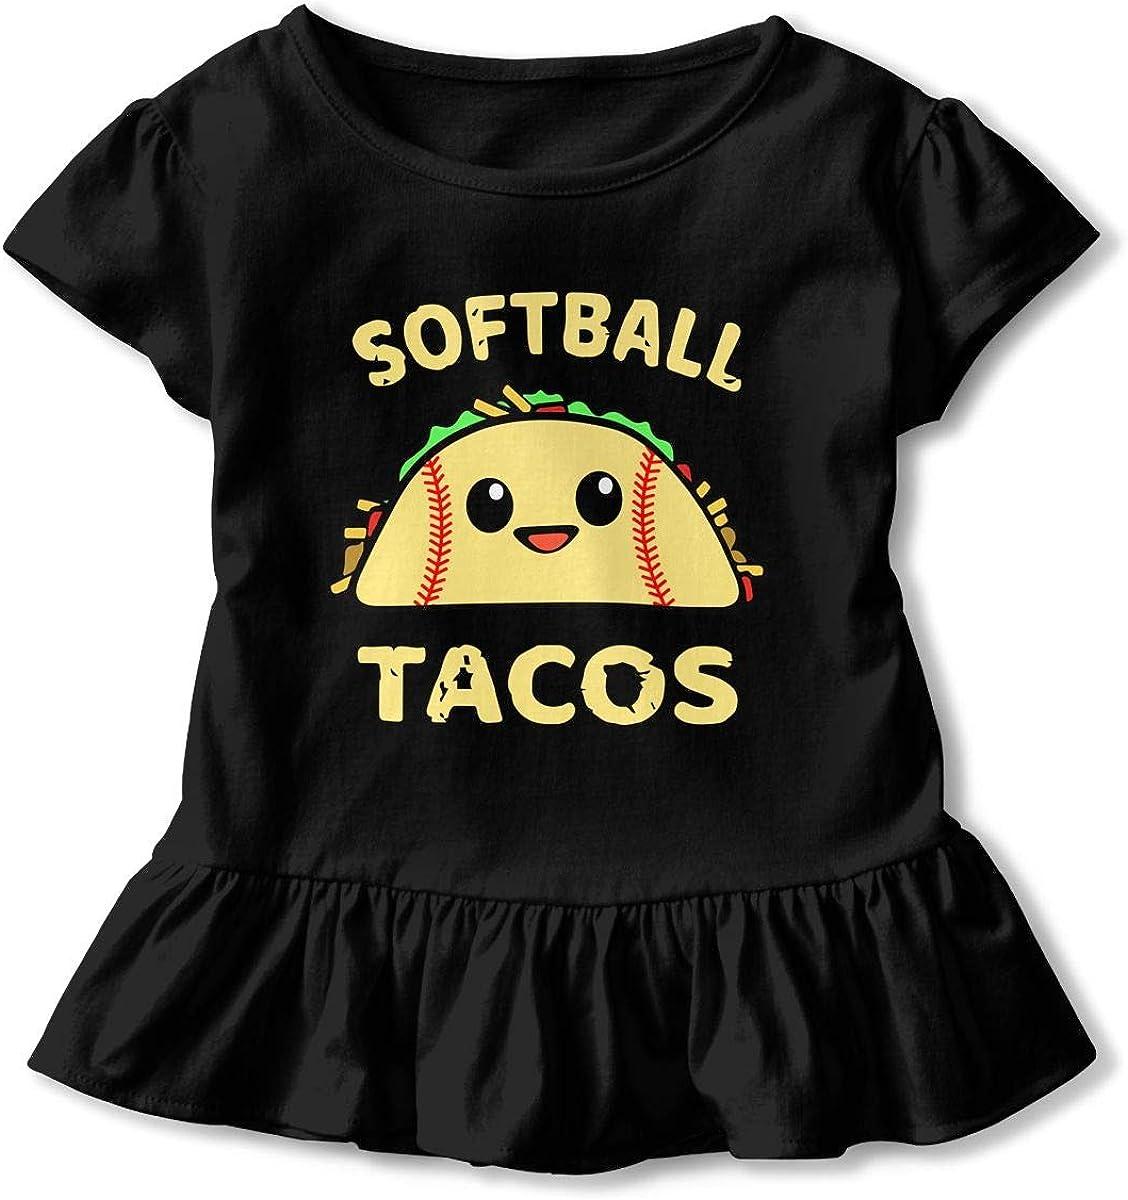 Cheng Jian Bo Softball and Tacos Funny Toddler Girls T Shirt Kids Cotton Short Sleeve Ruffle Tee